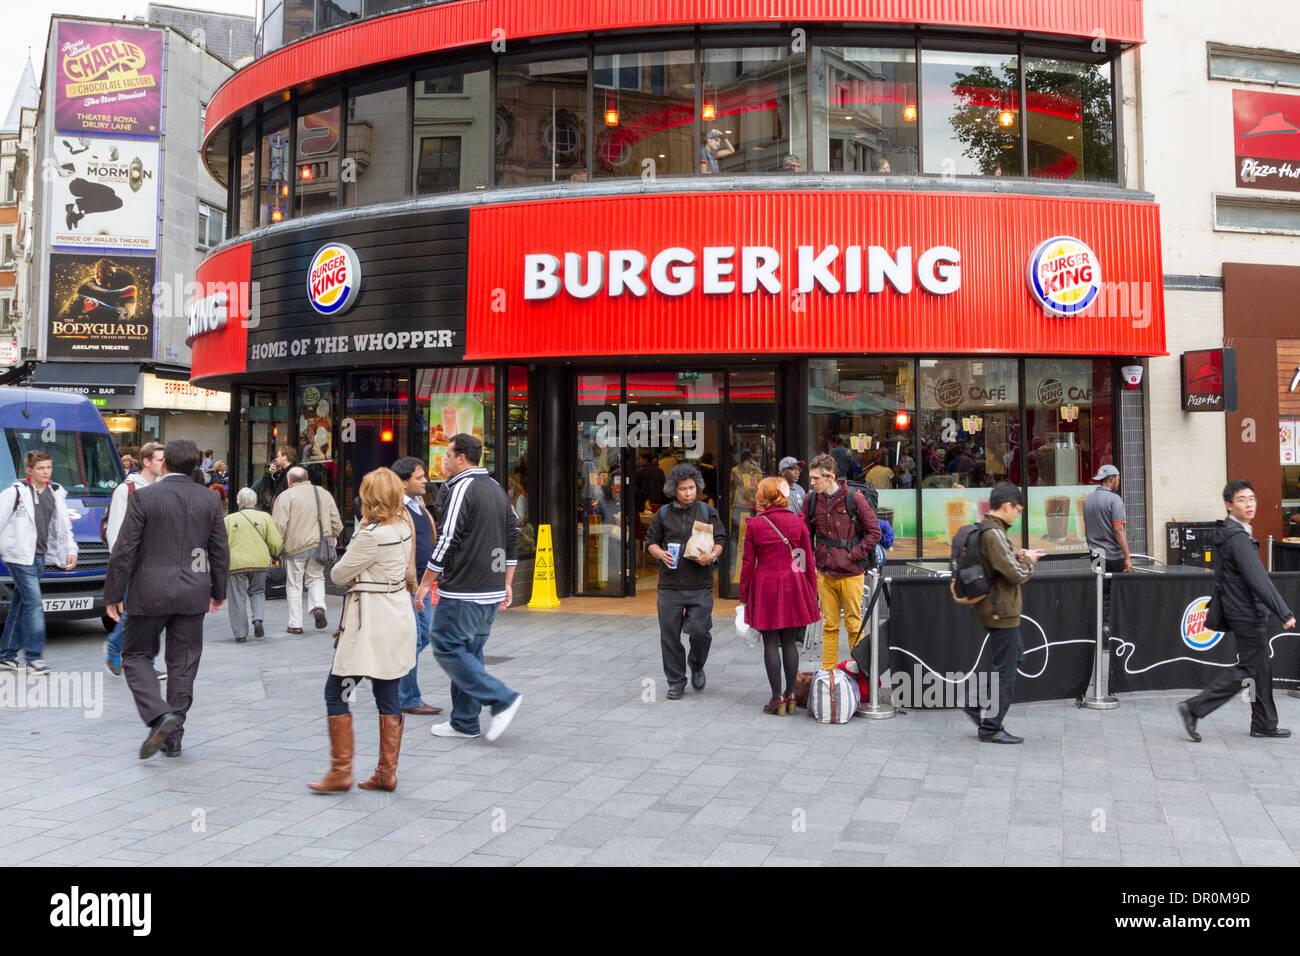 burger king fast food outlet leicester square england uk stock photo 65784137 alamy. Black Bedroom Furniture Sets. Home Design Ideas